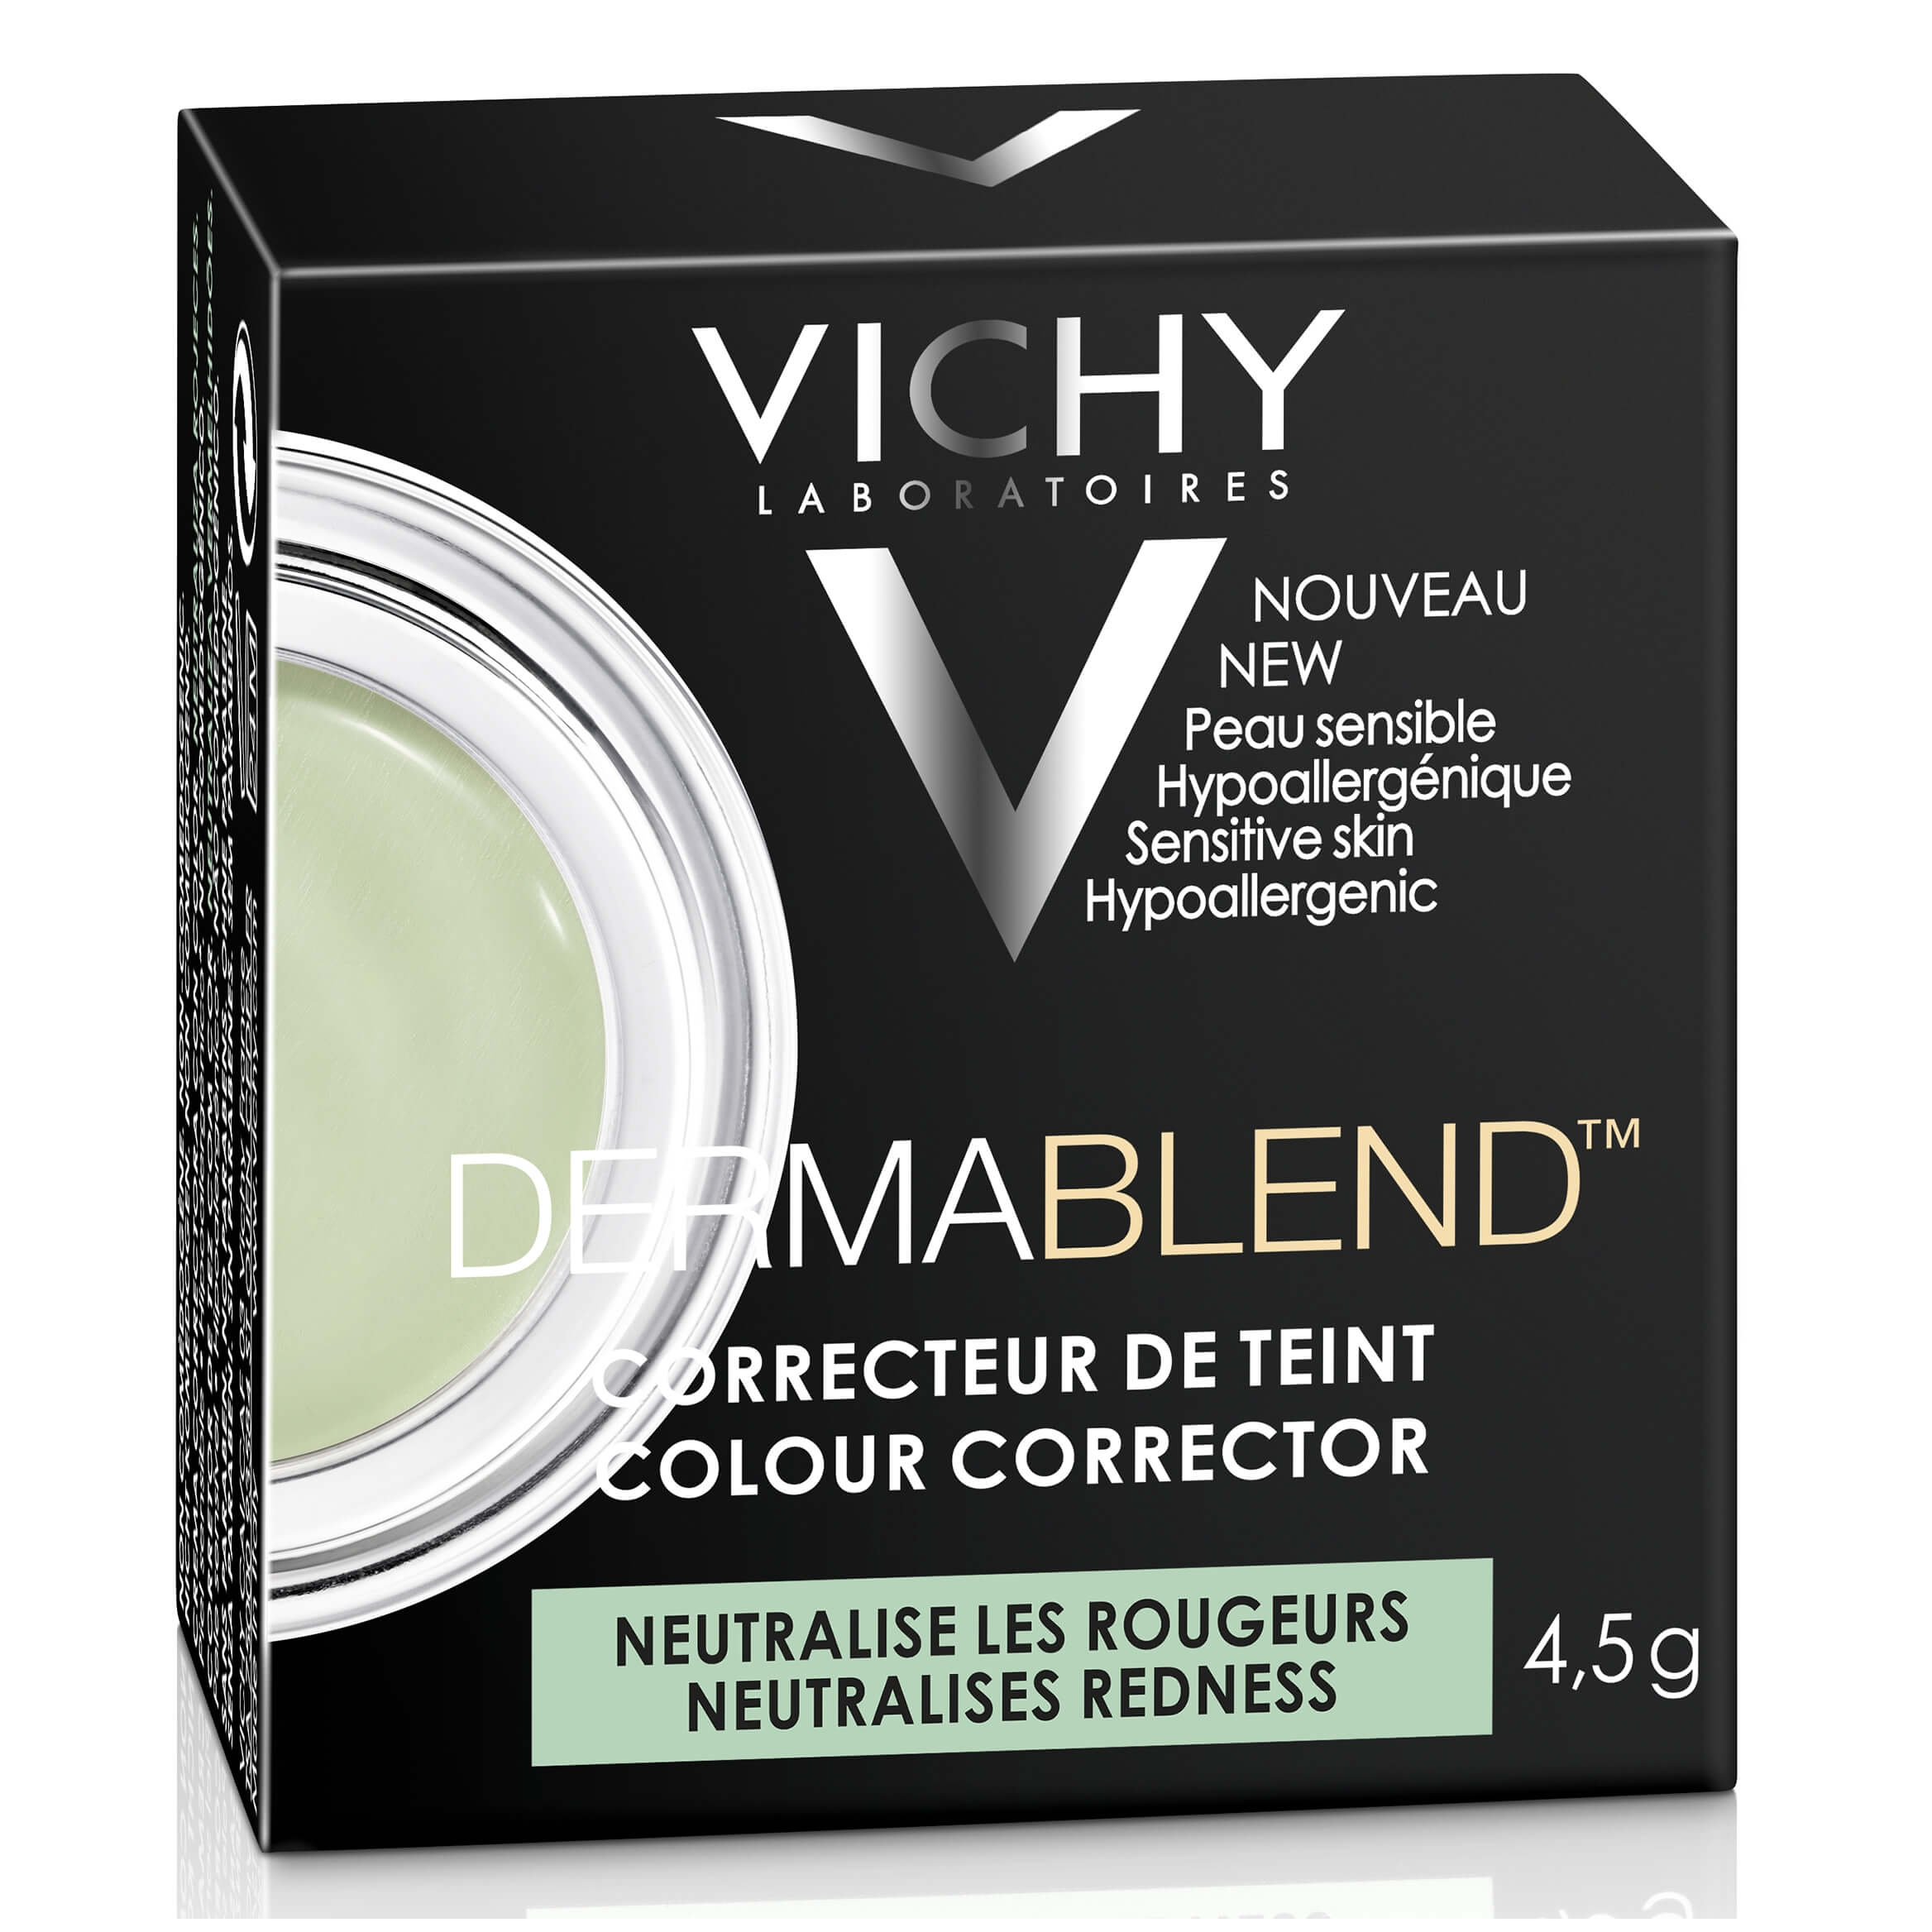 Vichy Dermablend Colour Corrector Εξουδετερώνει τις Ατέλειες στο Χρώμα του Δέρματος και Δημιουργεί μια Ομοιόμορφη Όψη 4,5g – Green